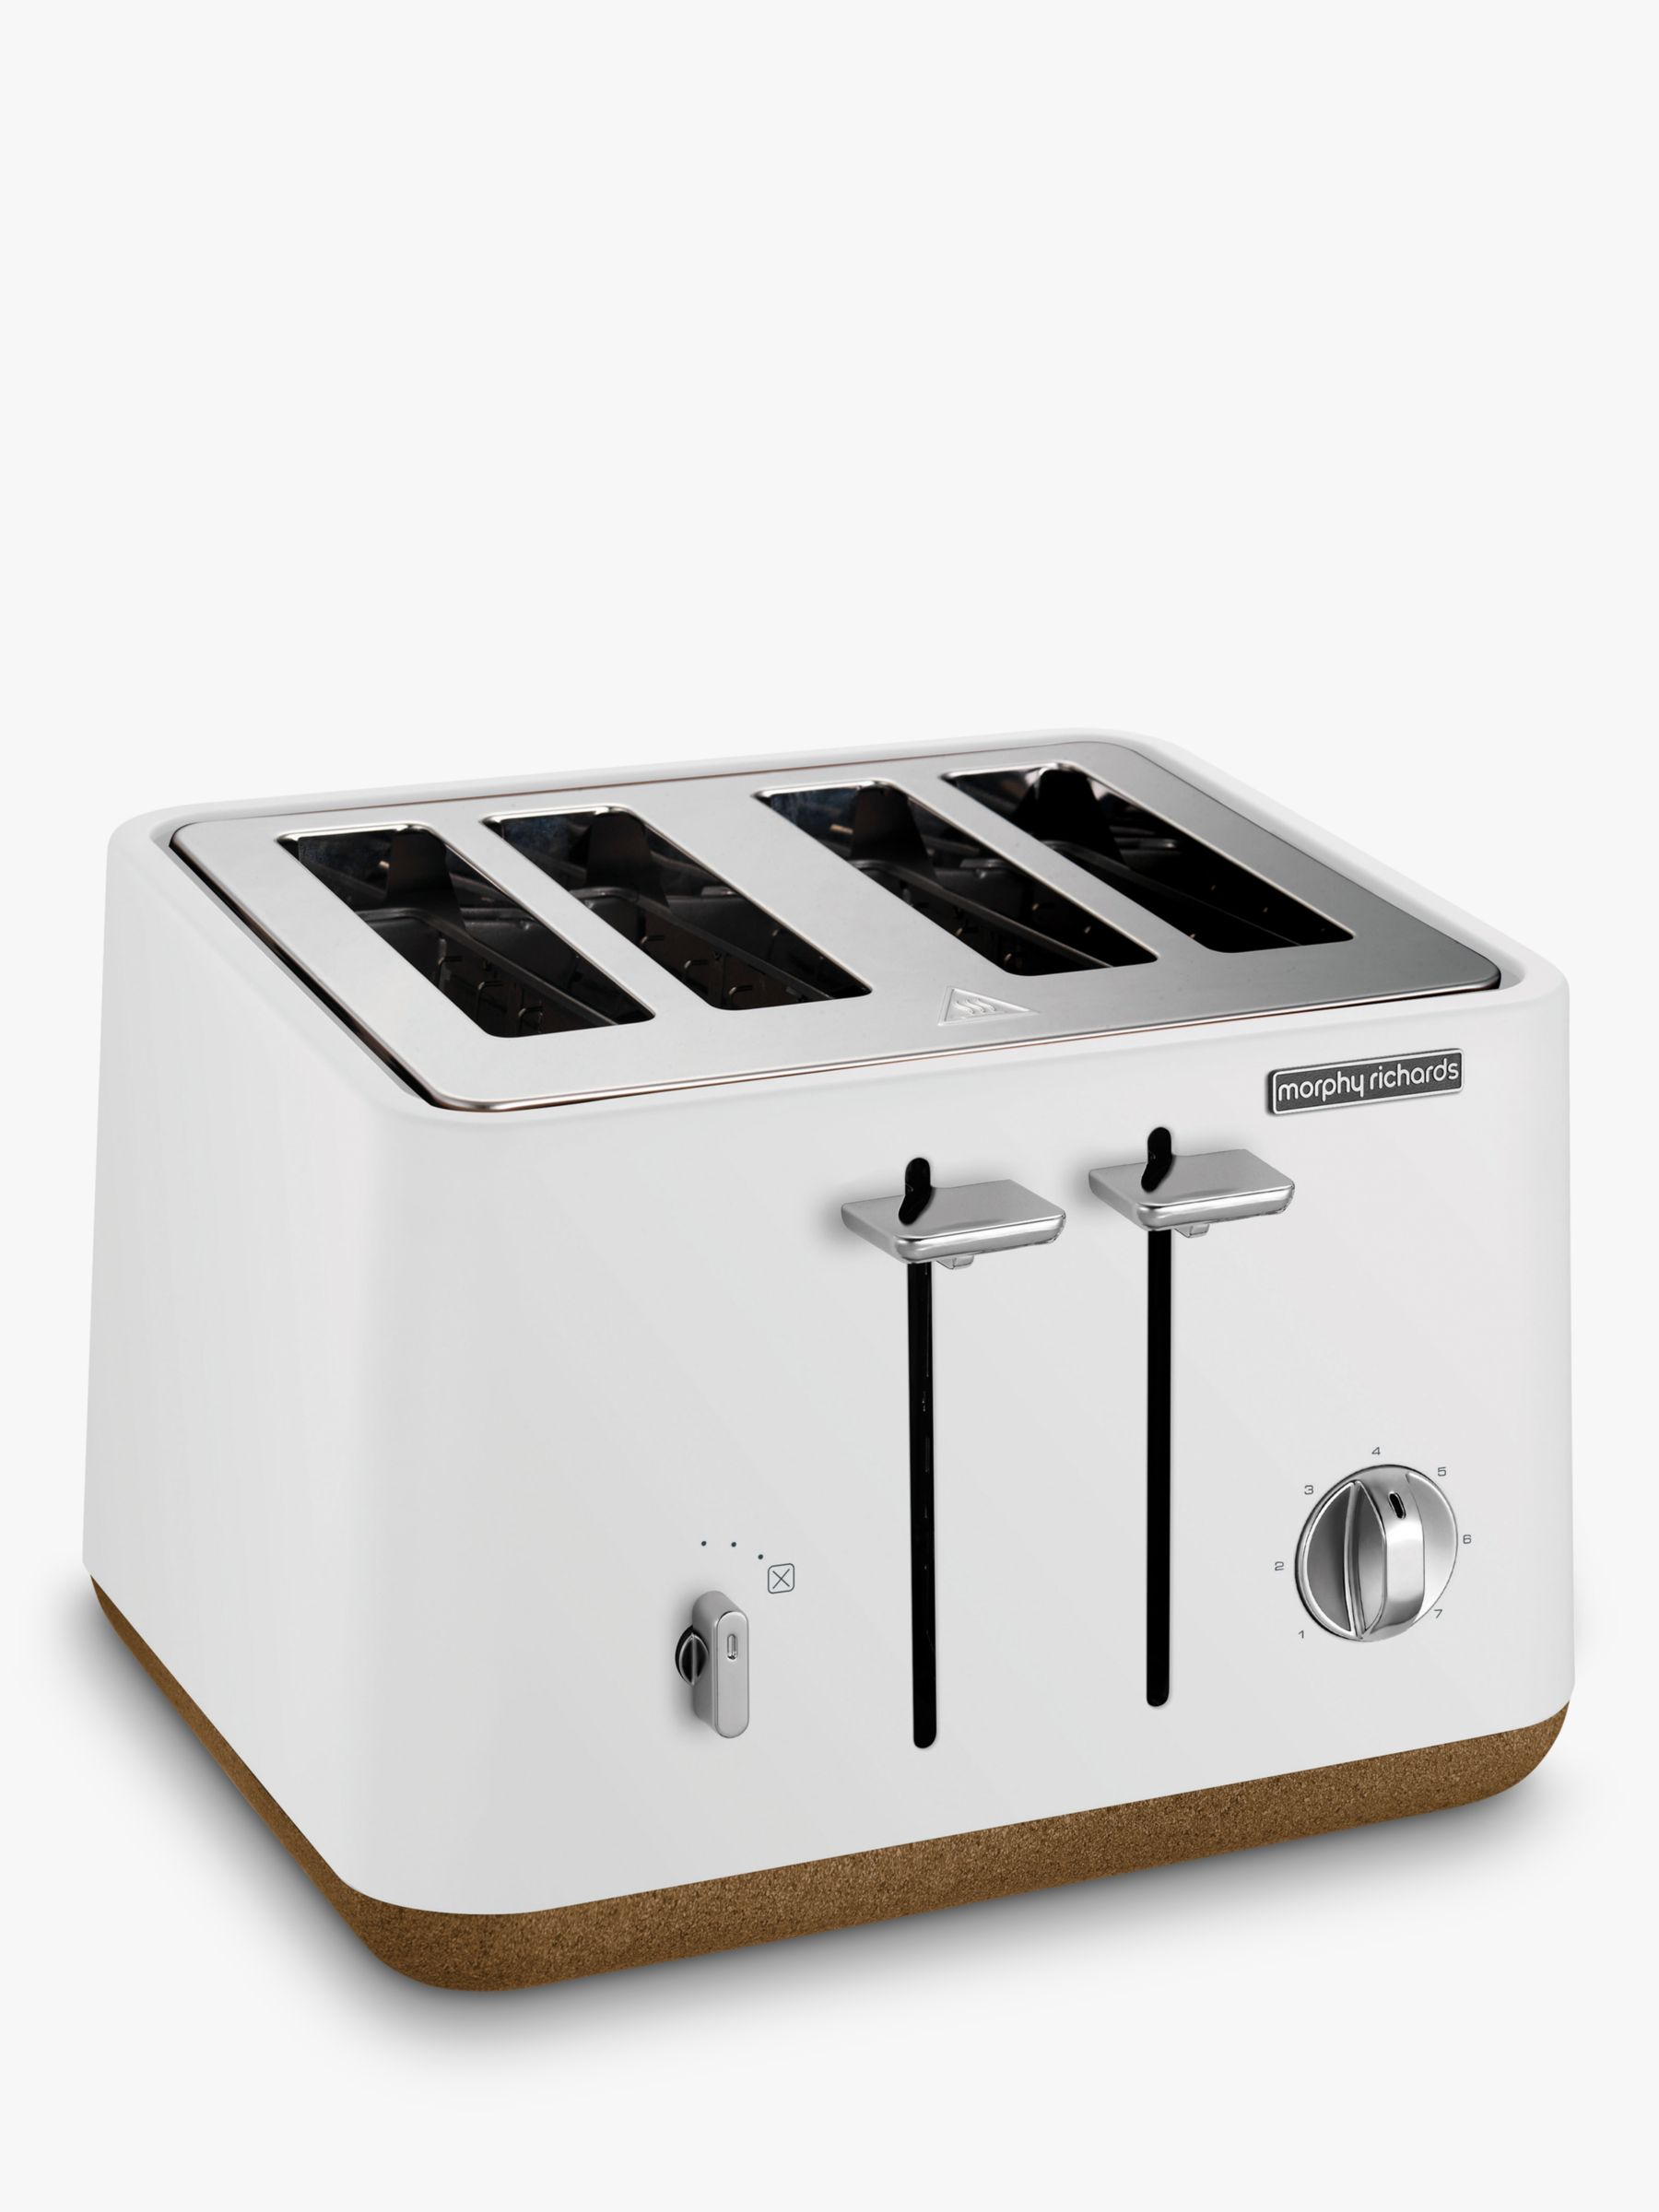 Morphy Richards Morphy Richards Aspect 4-Slice Toaster, White